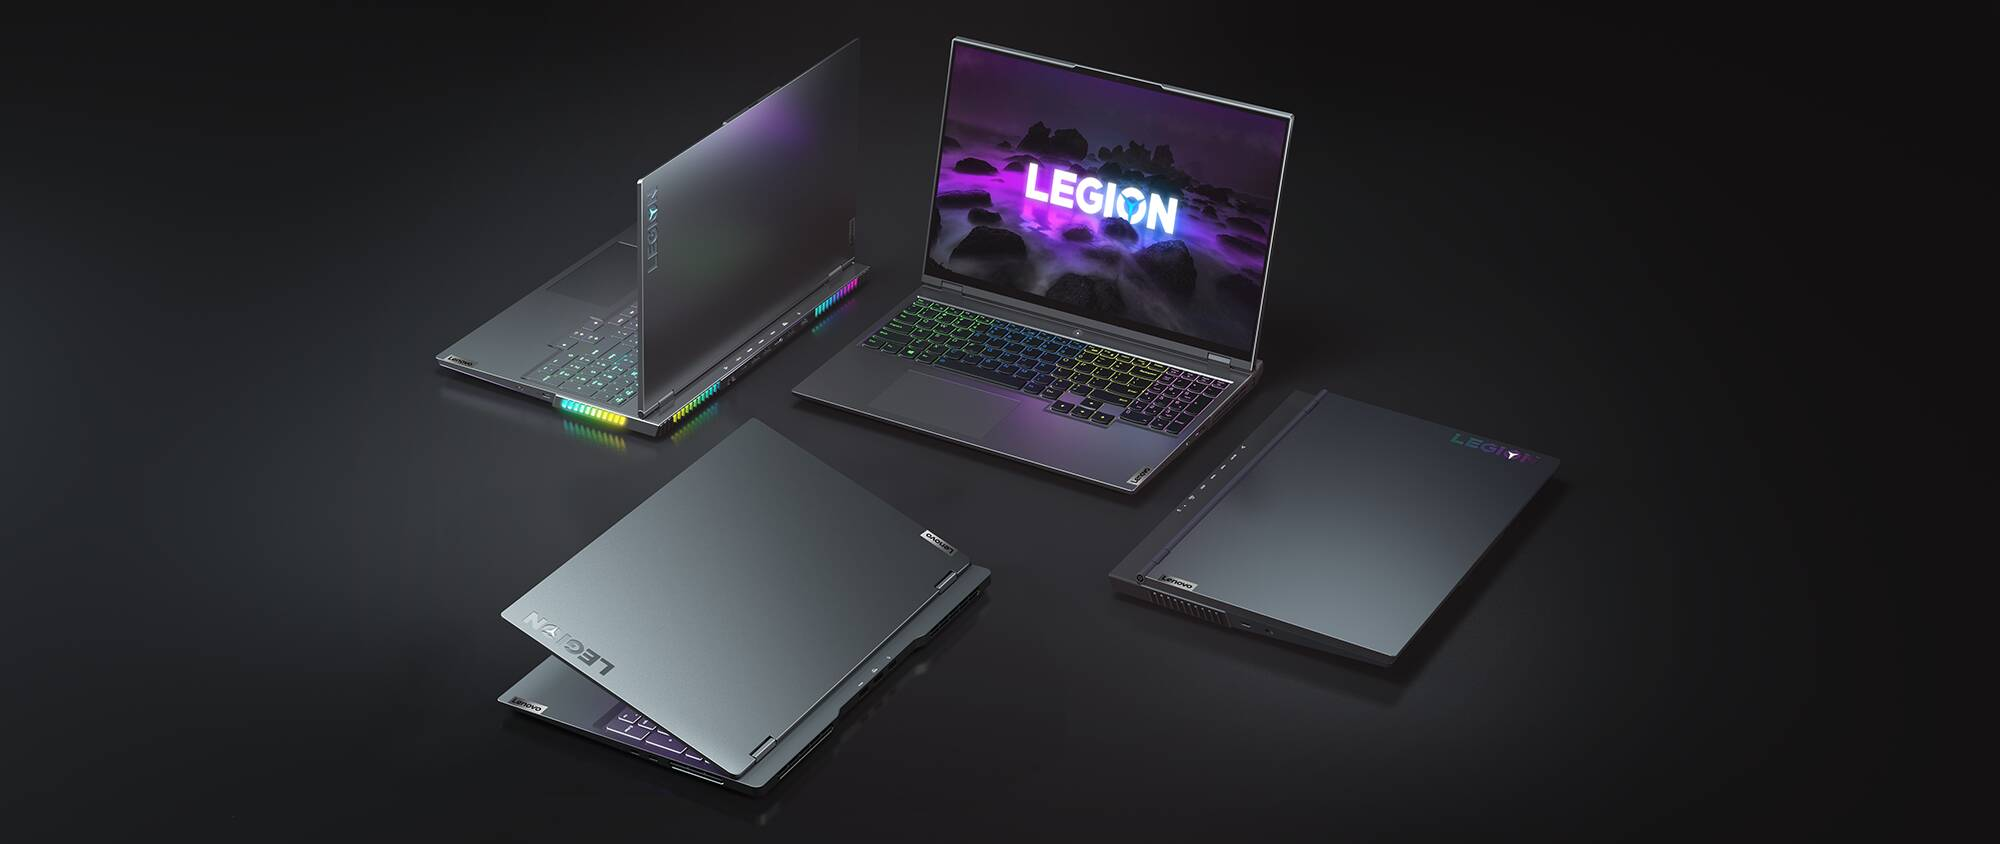 Lenovo Legion CES 2021